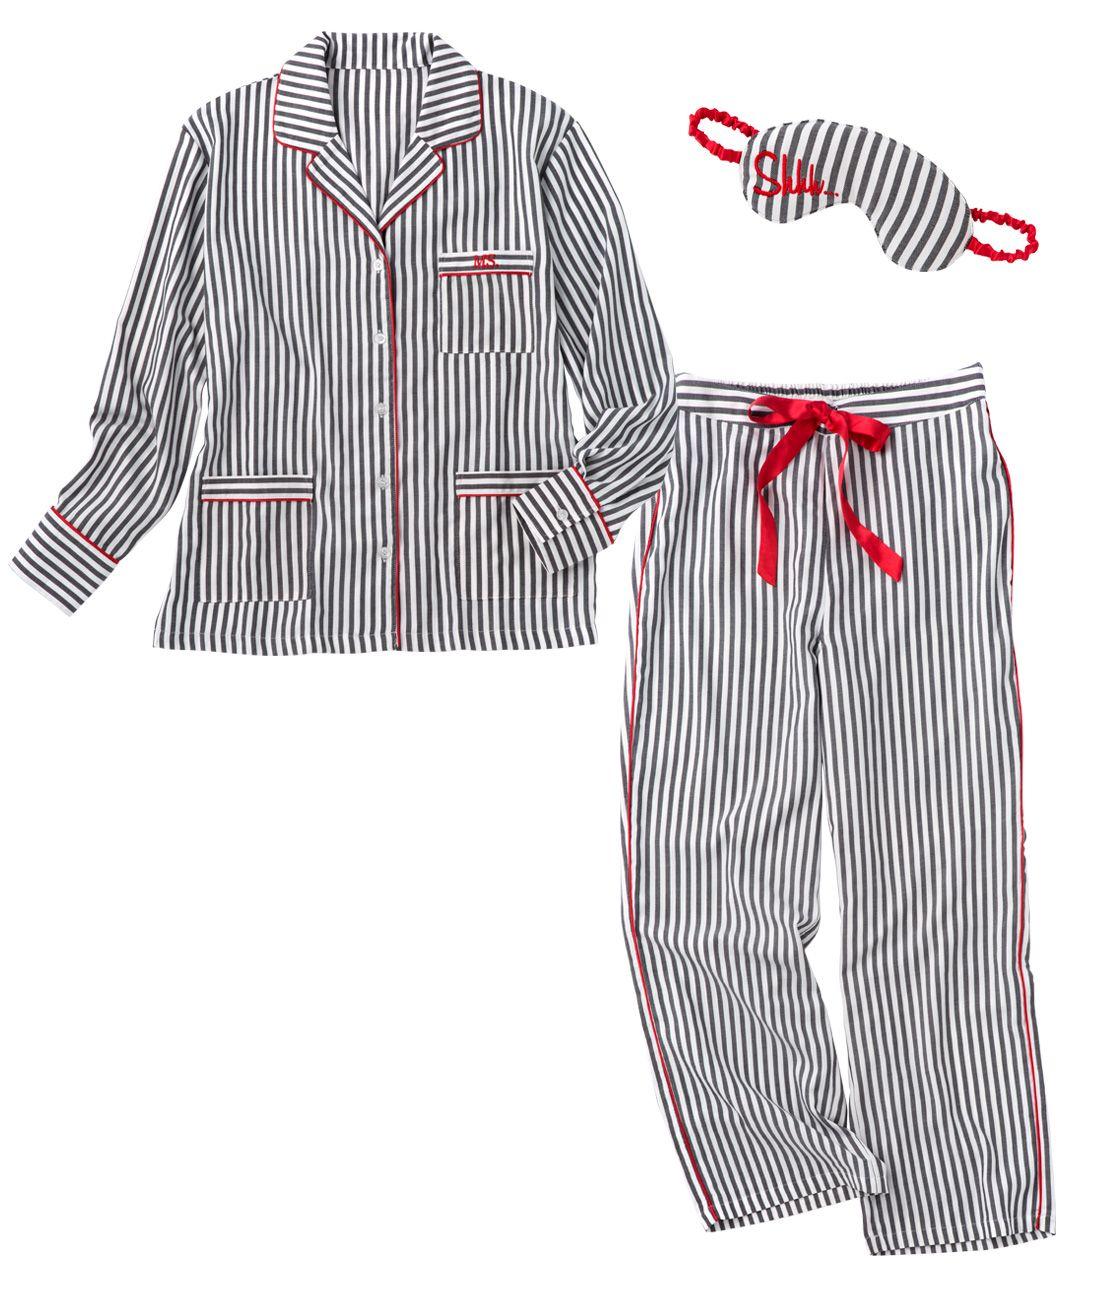 Shirt pajamas set